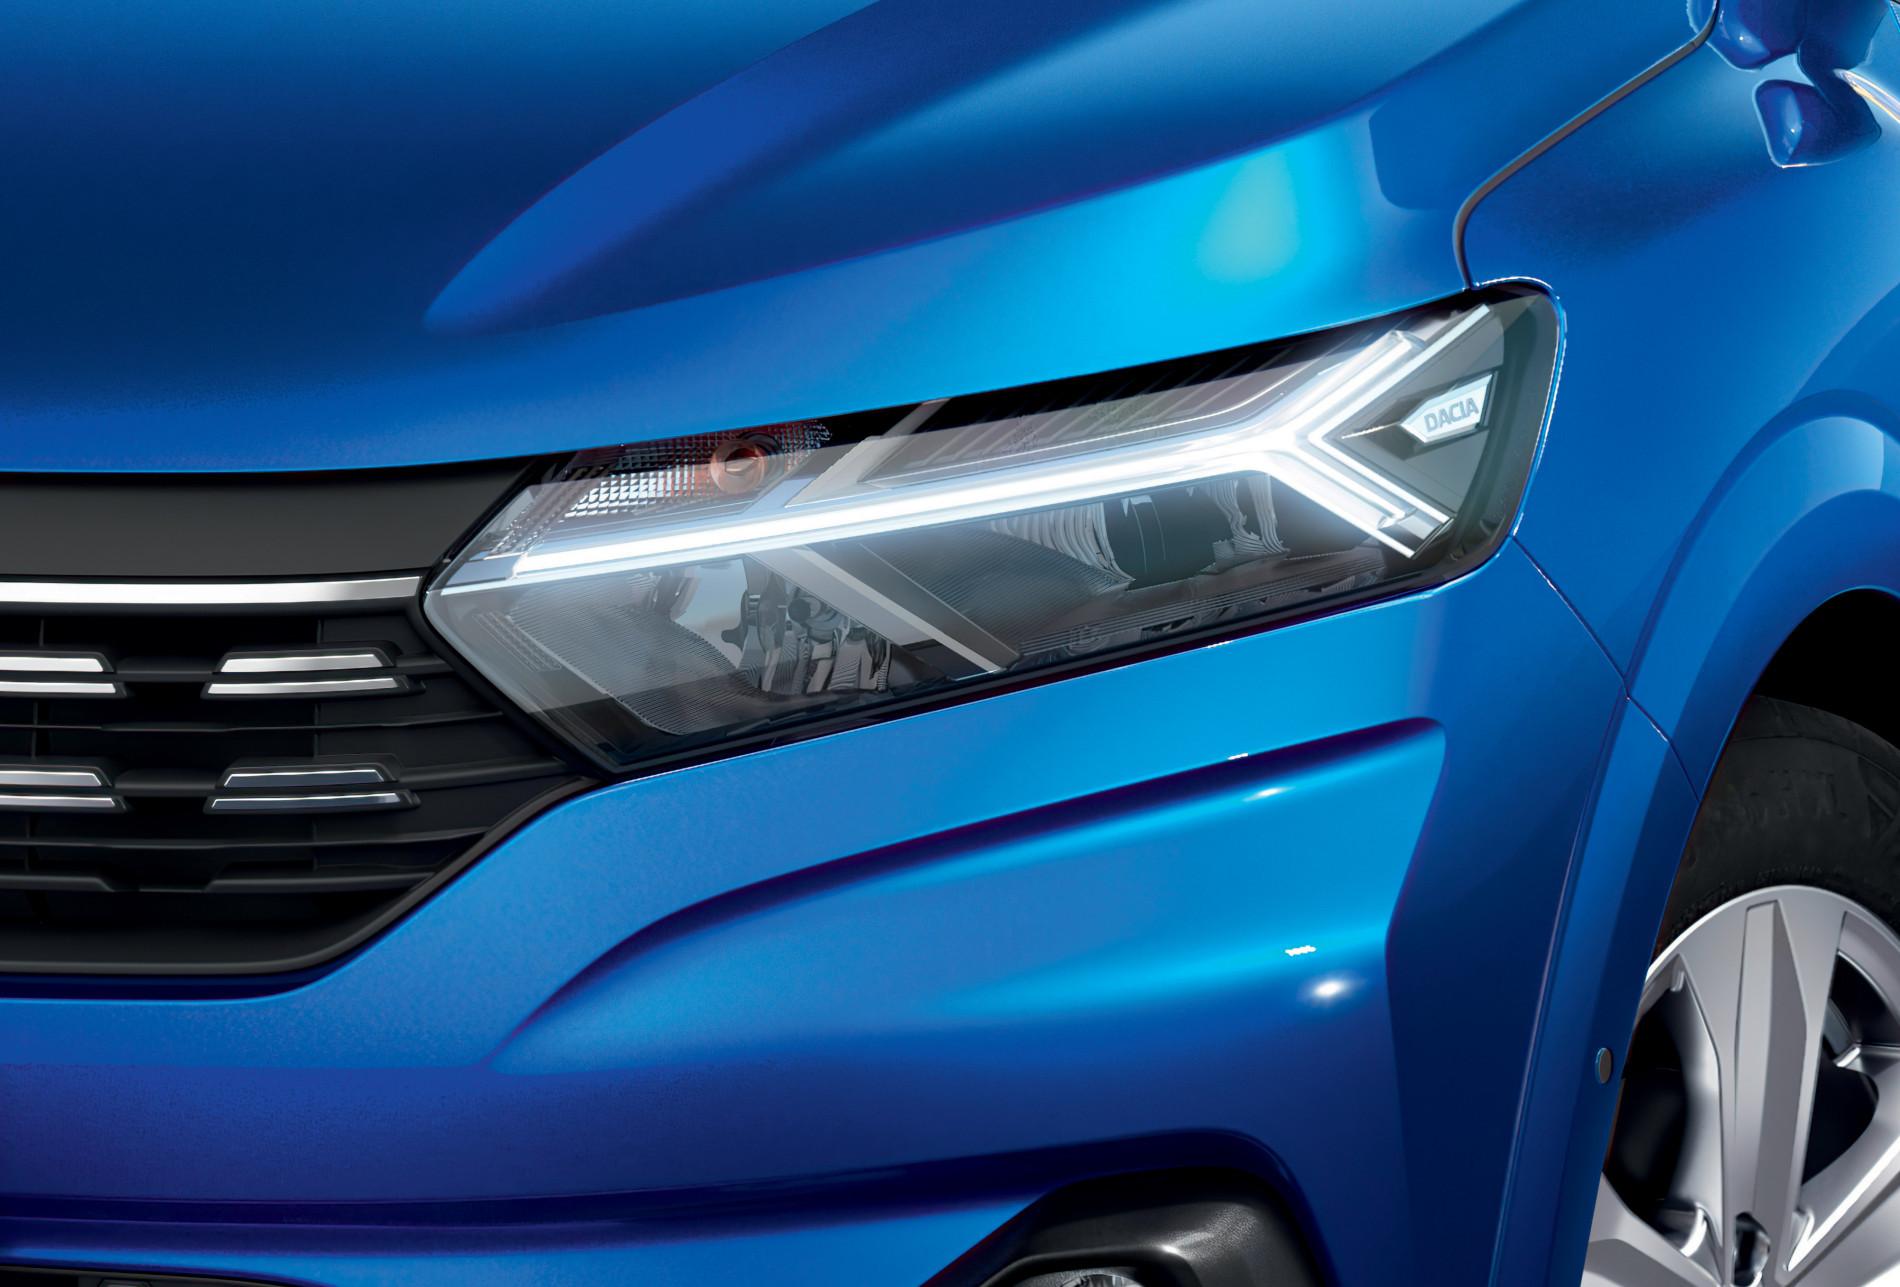 Detaliile care tranforma noile Dacia Logan si Sandero intr-o masina de nerefuzat - Detaliile care tranforma noile Dacia Logan si Sandero intr-o masina de nerefuzat